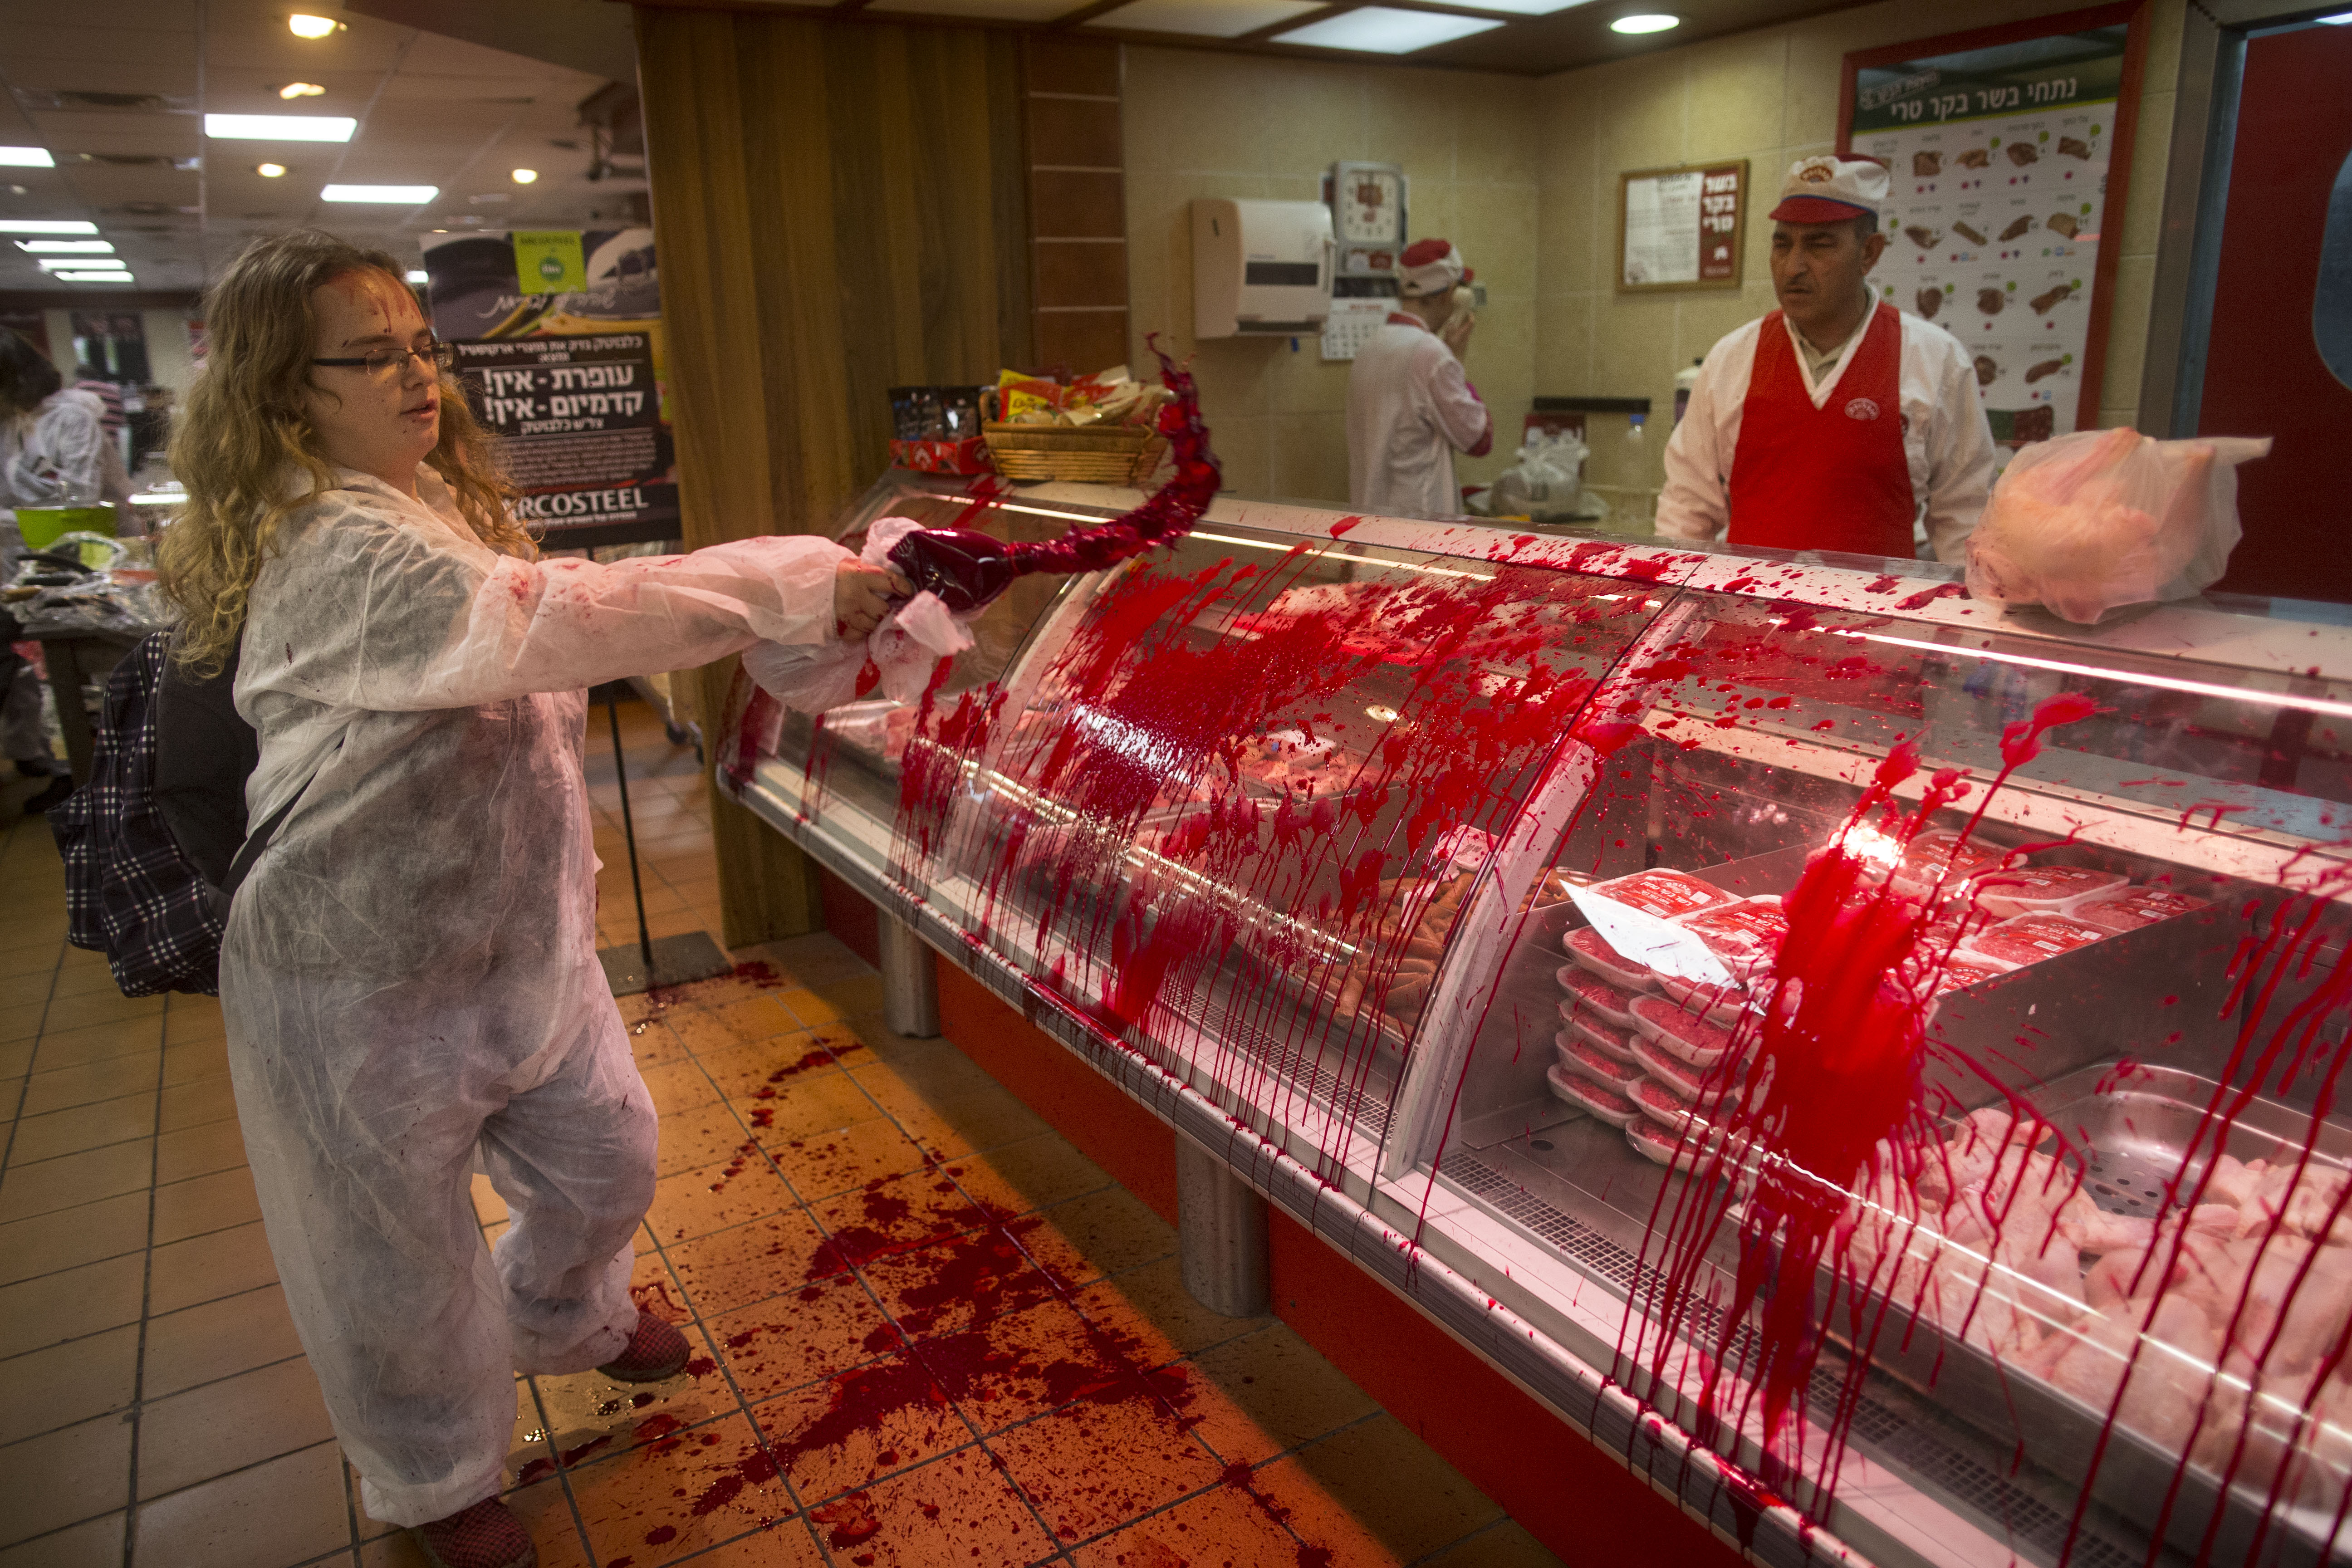 La protesta shock (e splatter) degli animalisti